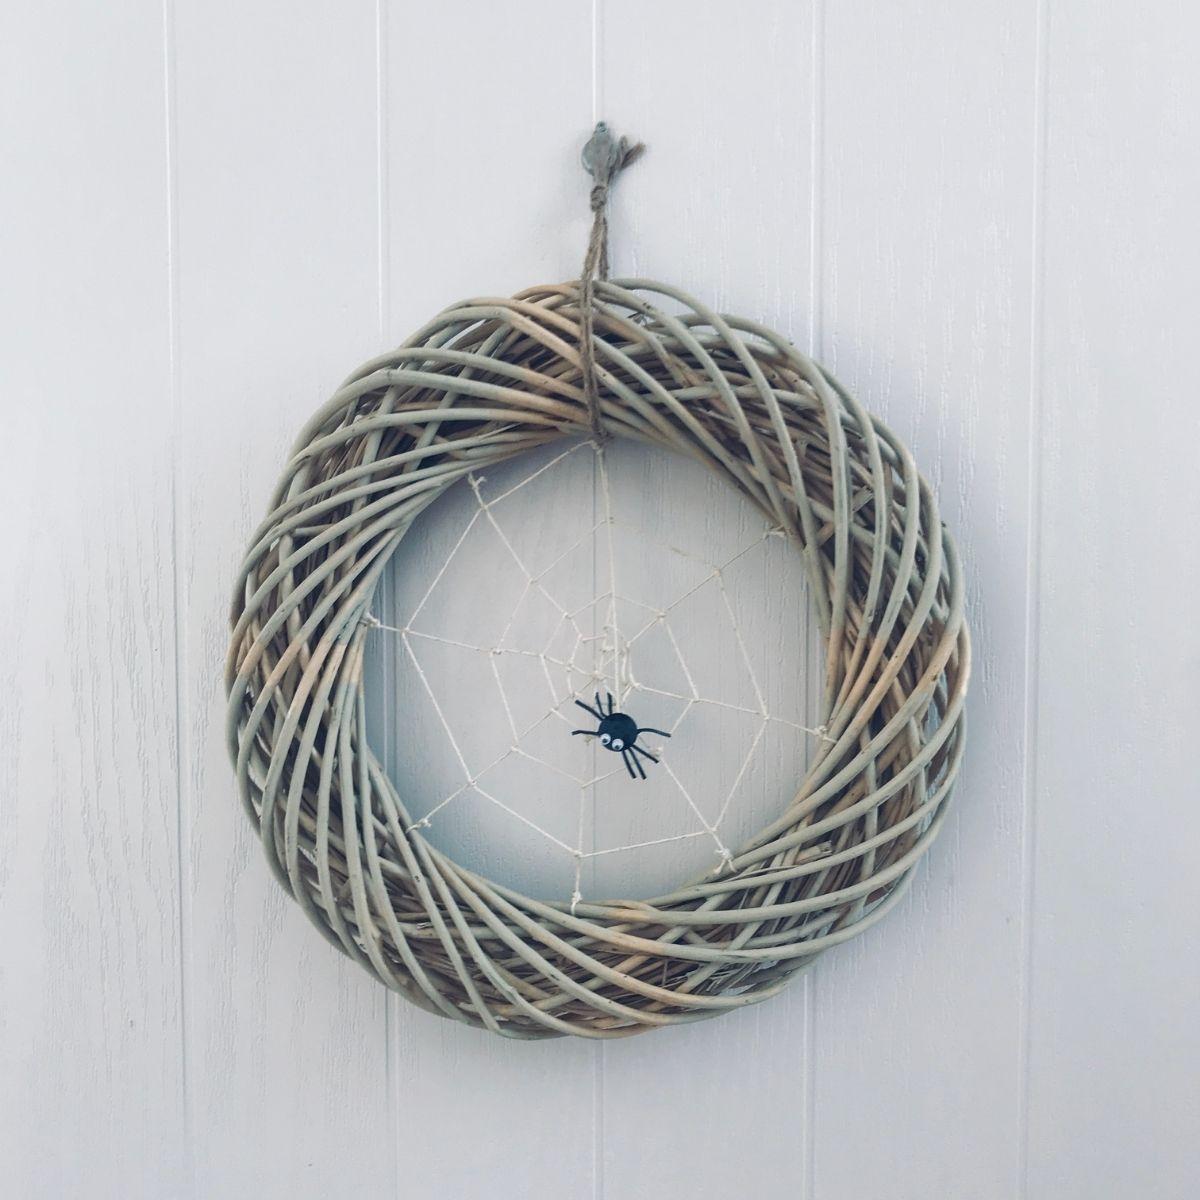 Halloween Craft Ideas - Spider Web Wreath Ideas - Pikalily Blog